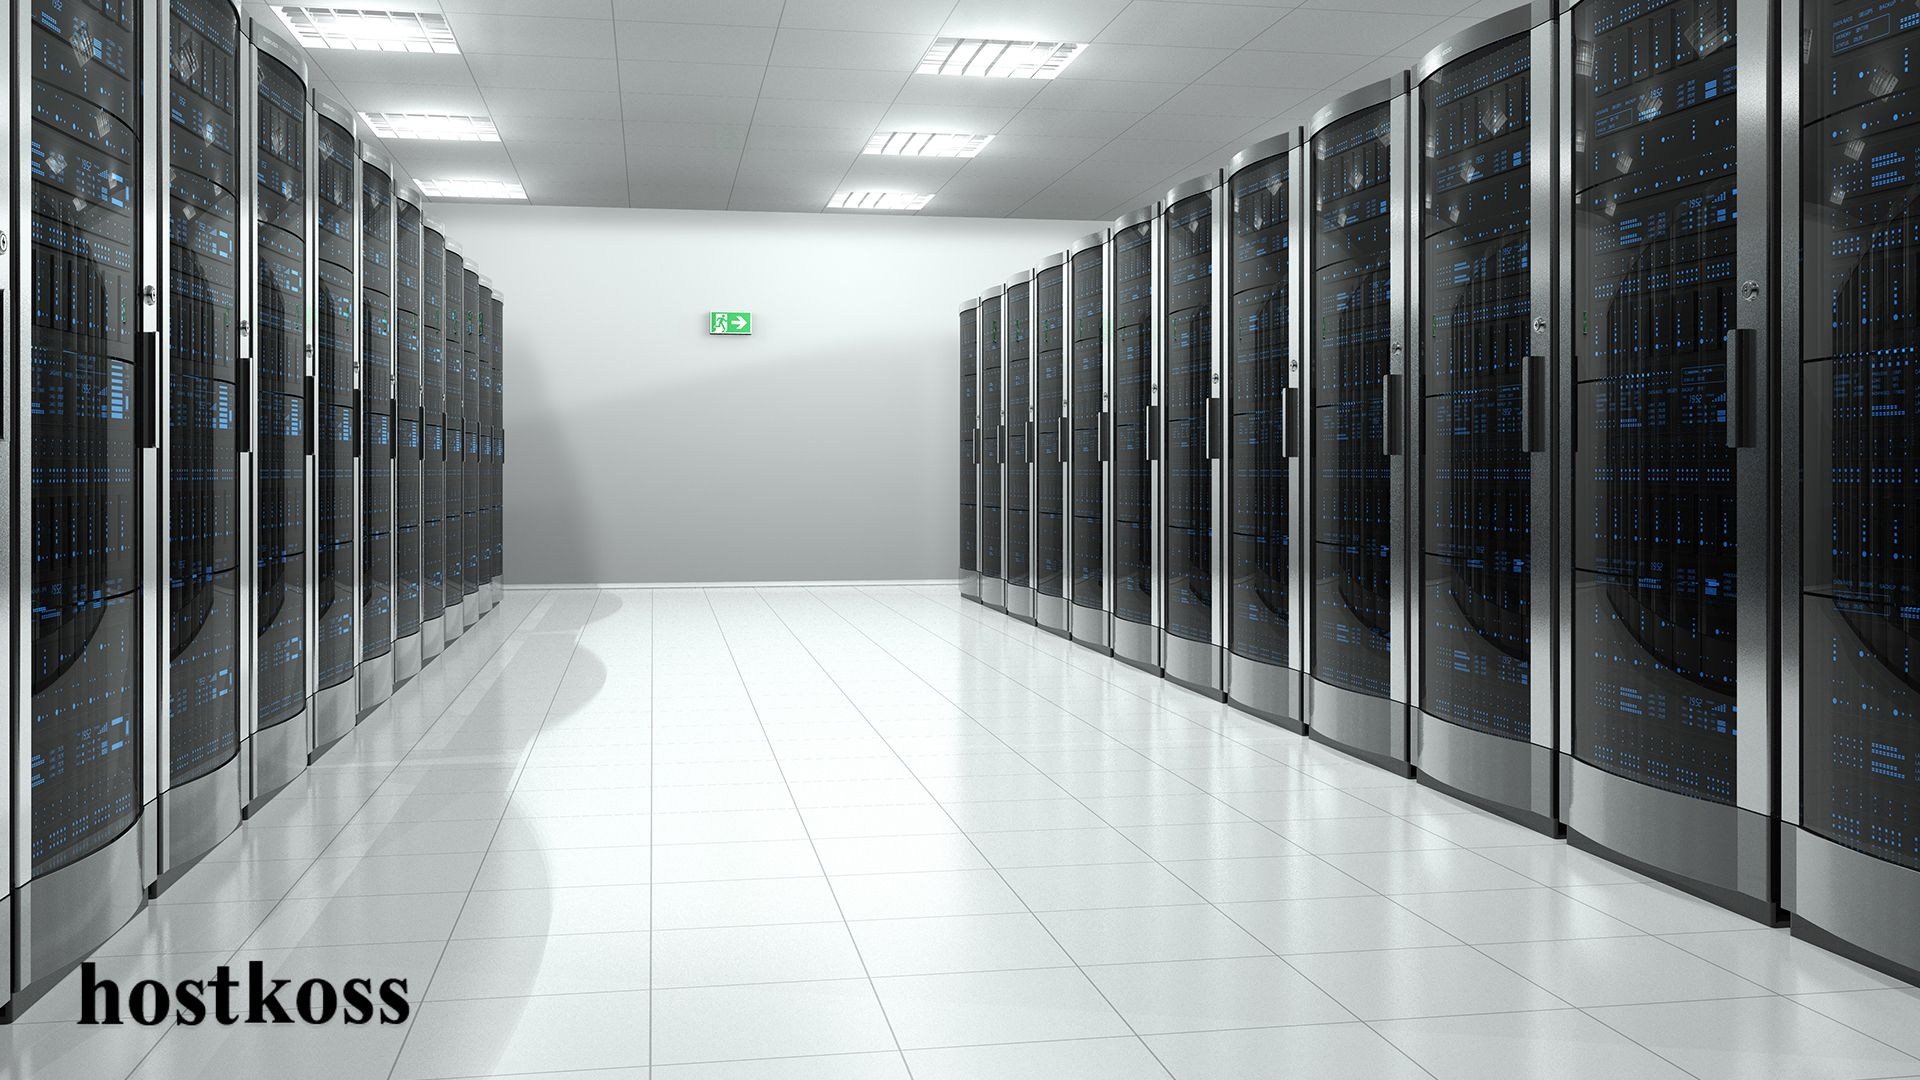 My 3d server хостинг хостинг 1 месяц бесплатно